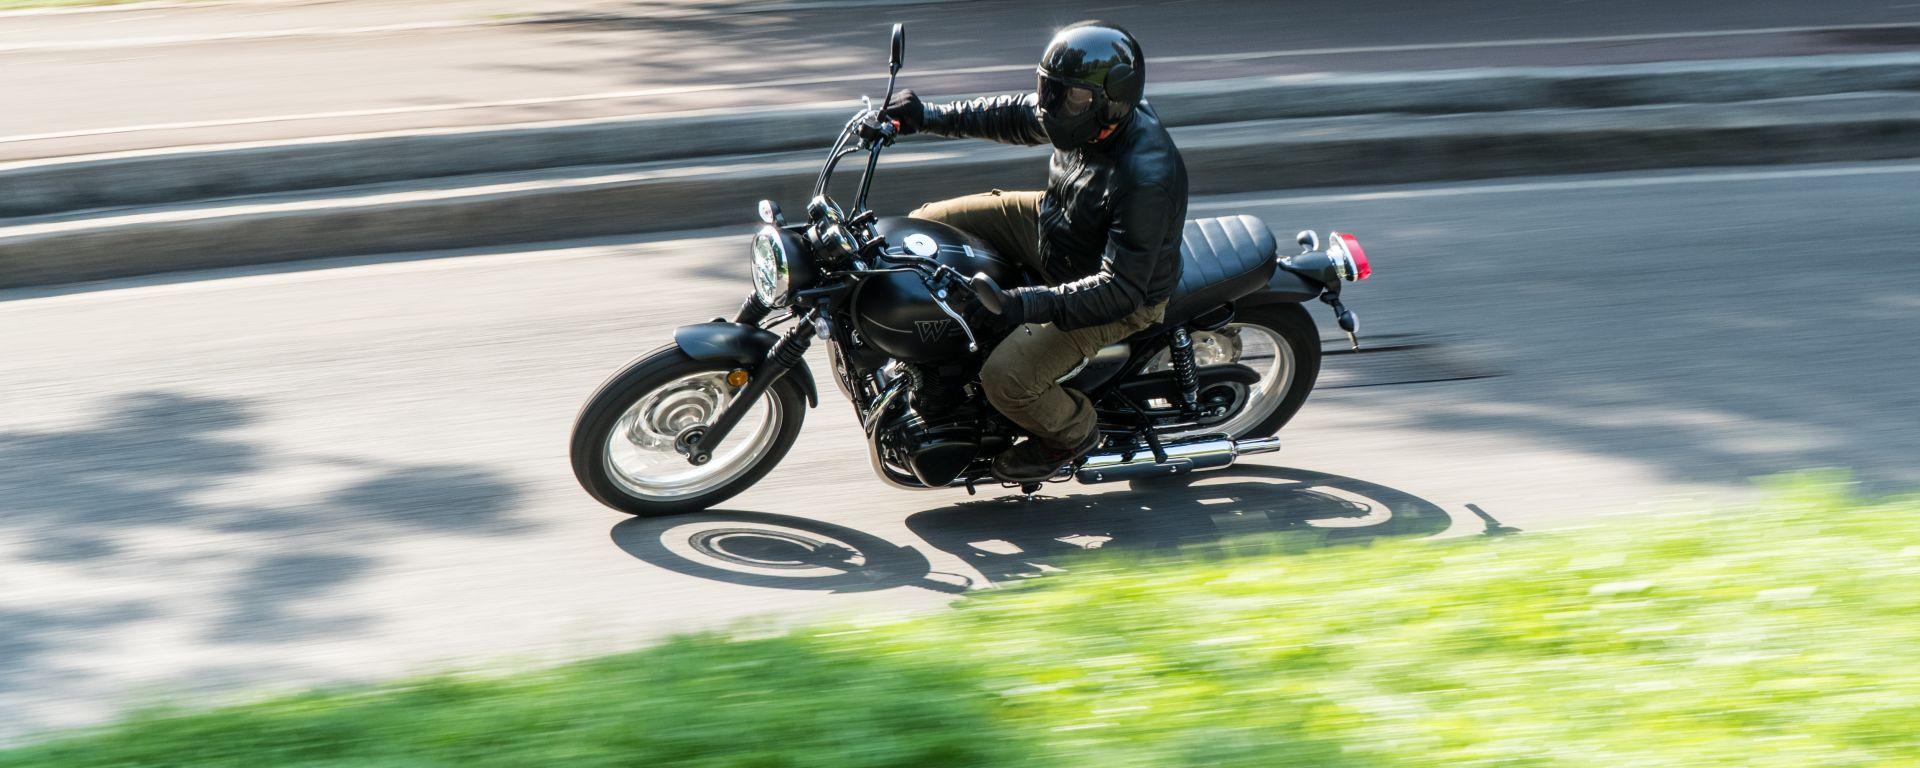 Kawasaki W 800 Street 2019: la prova su strada